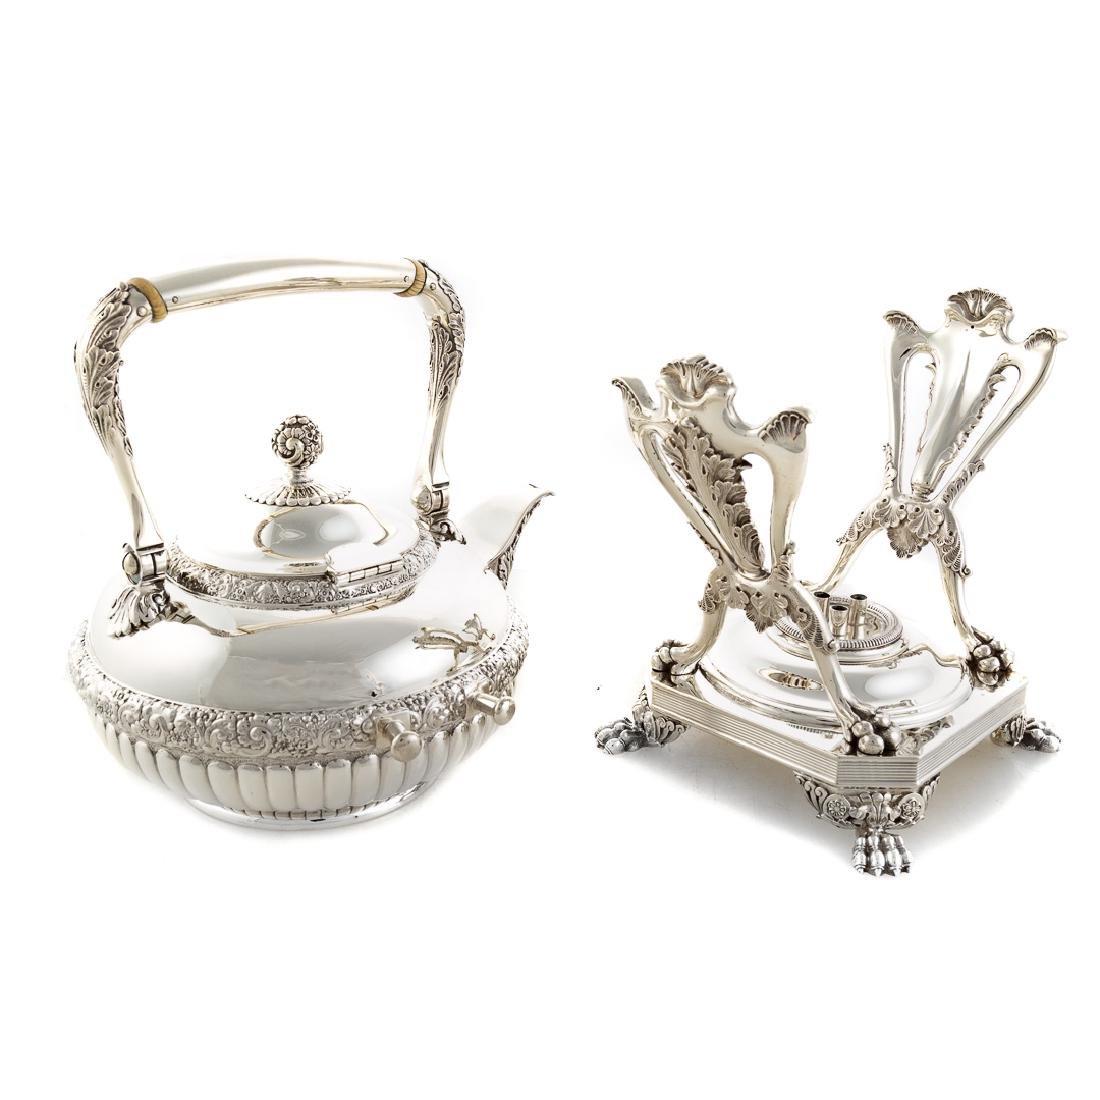 Very fine Tiffany sterling coffee & tea service - 5